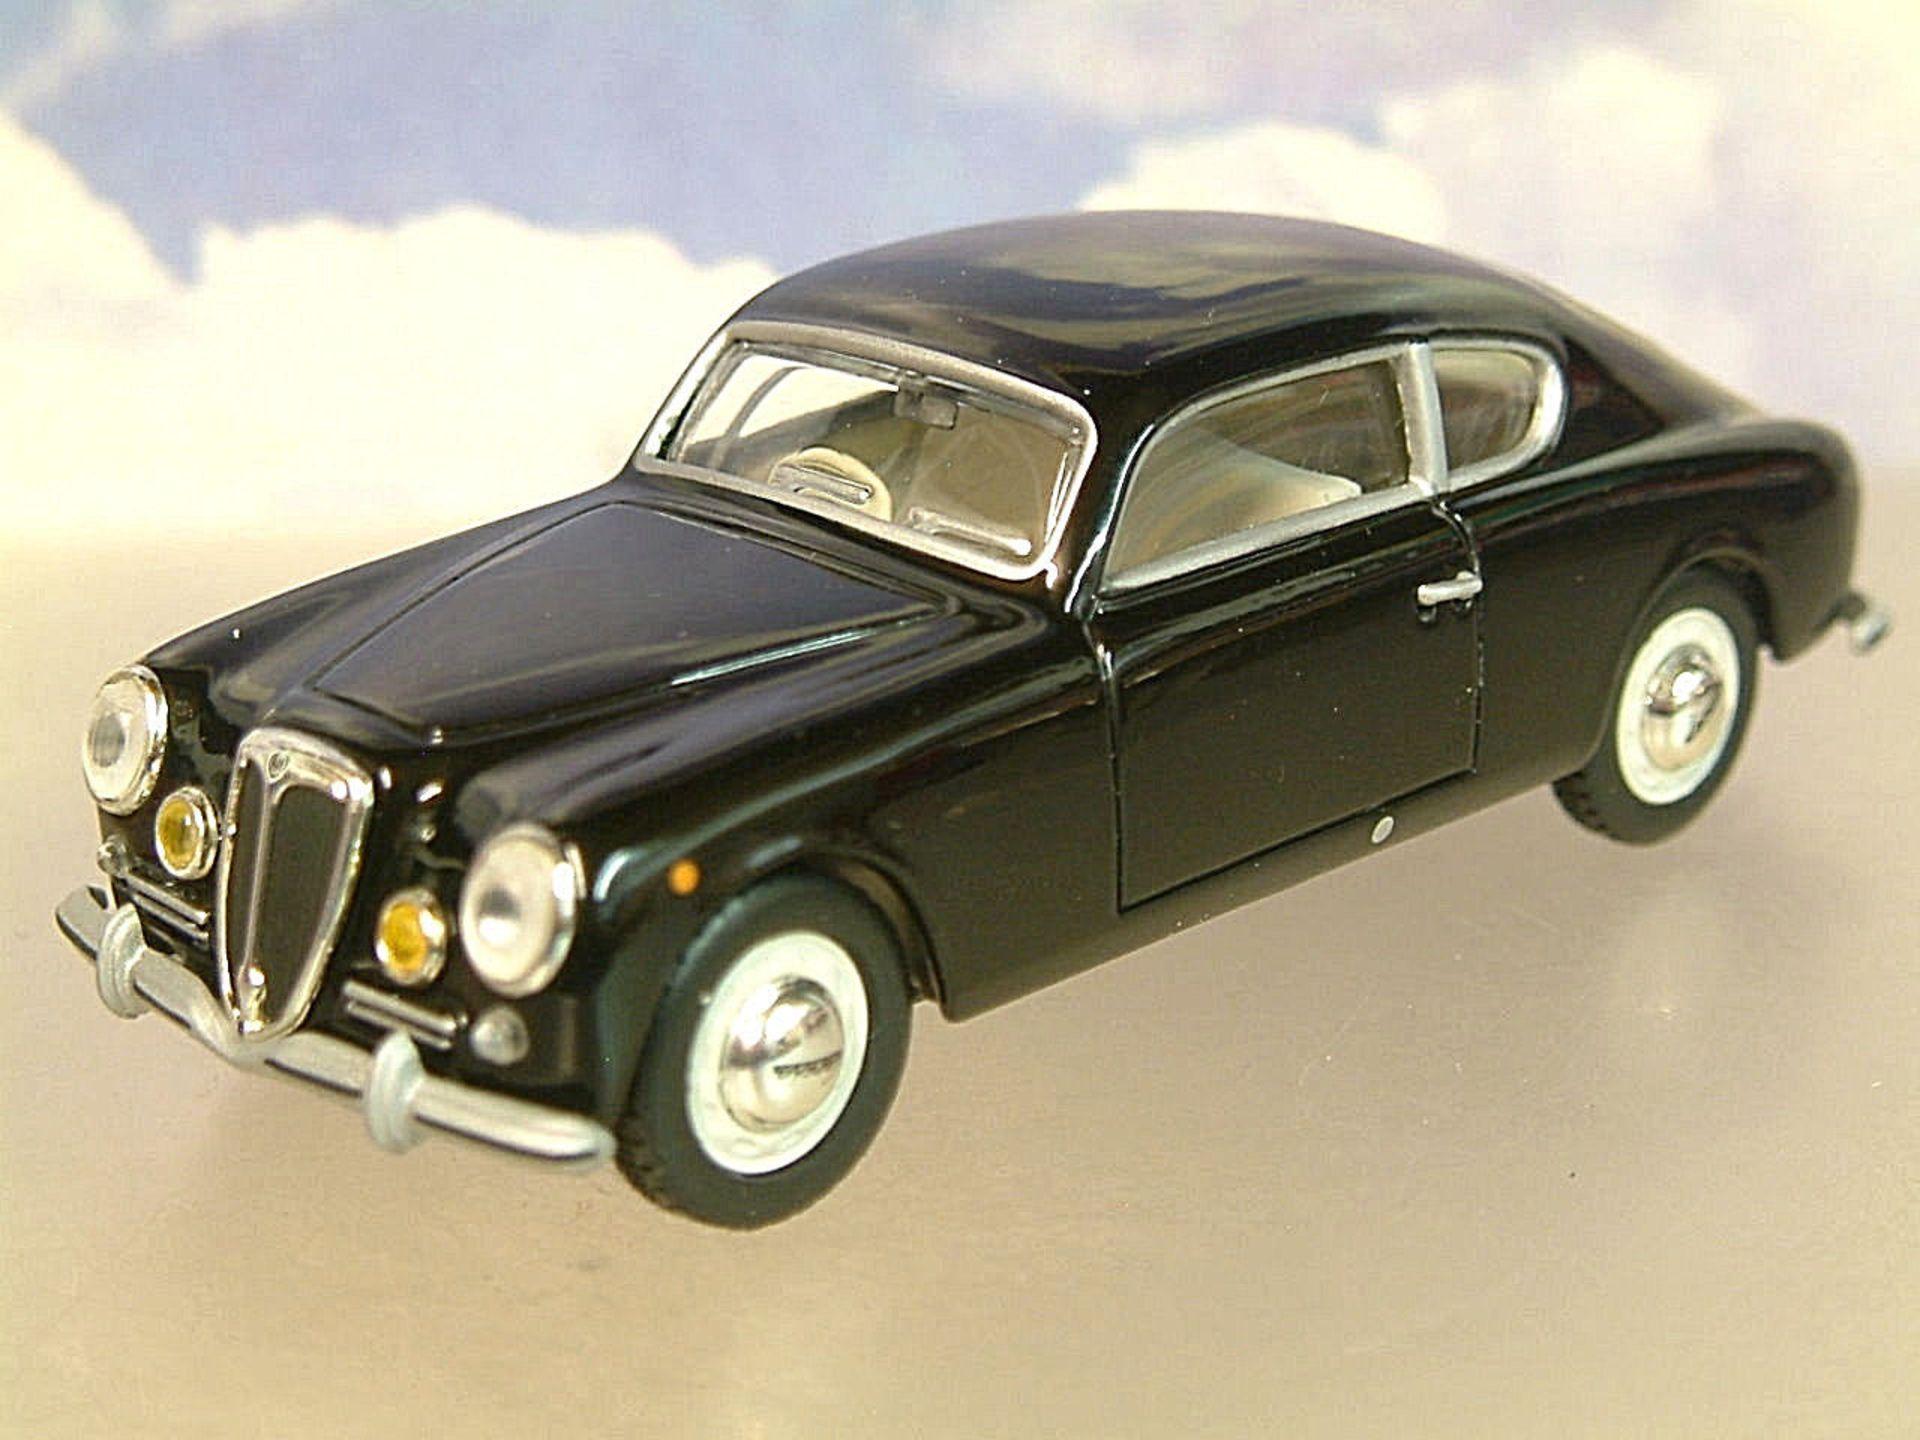 Lot 10026 - V Brand New 1/43 Diecast 1951 Lancia Aurelia Gran Turismo GT B20 - eBay Price £14.95